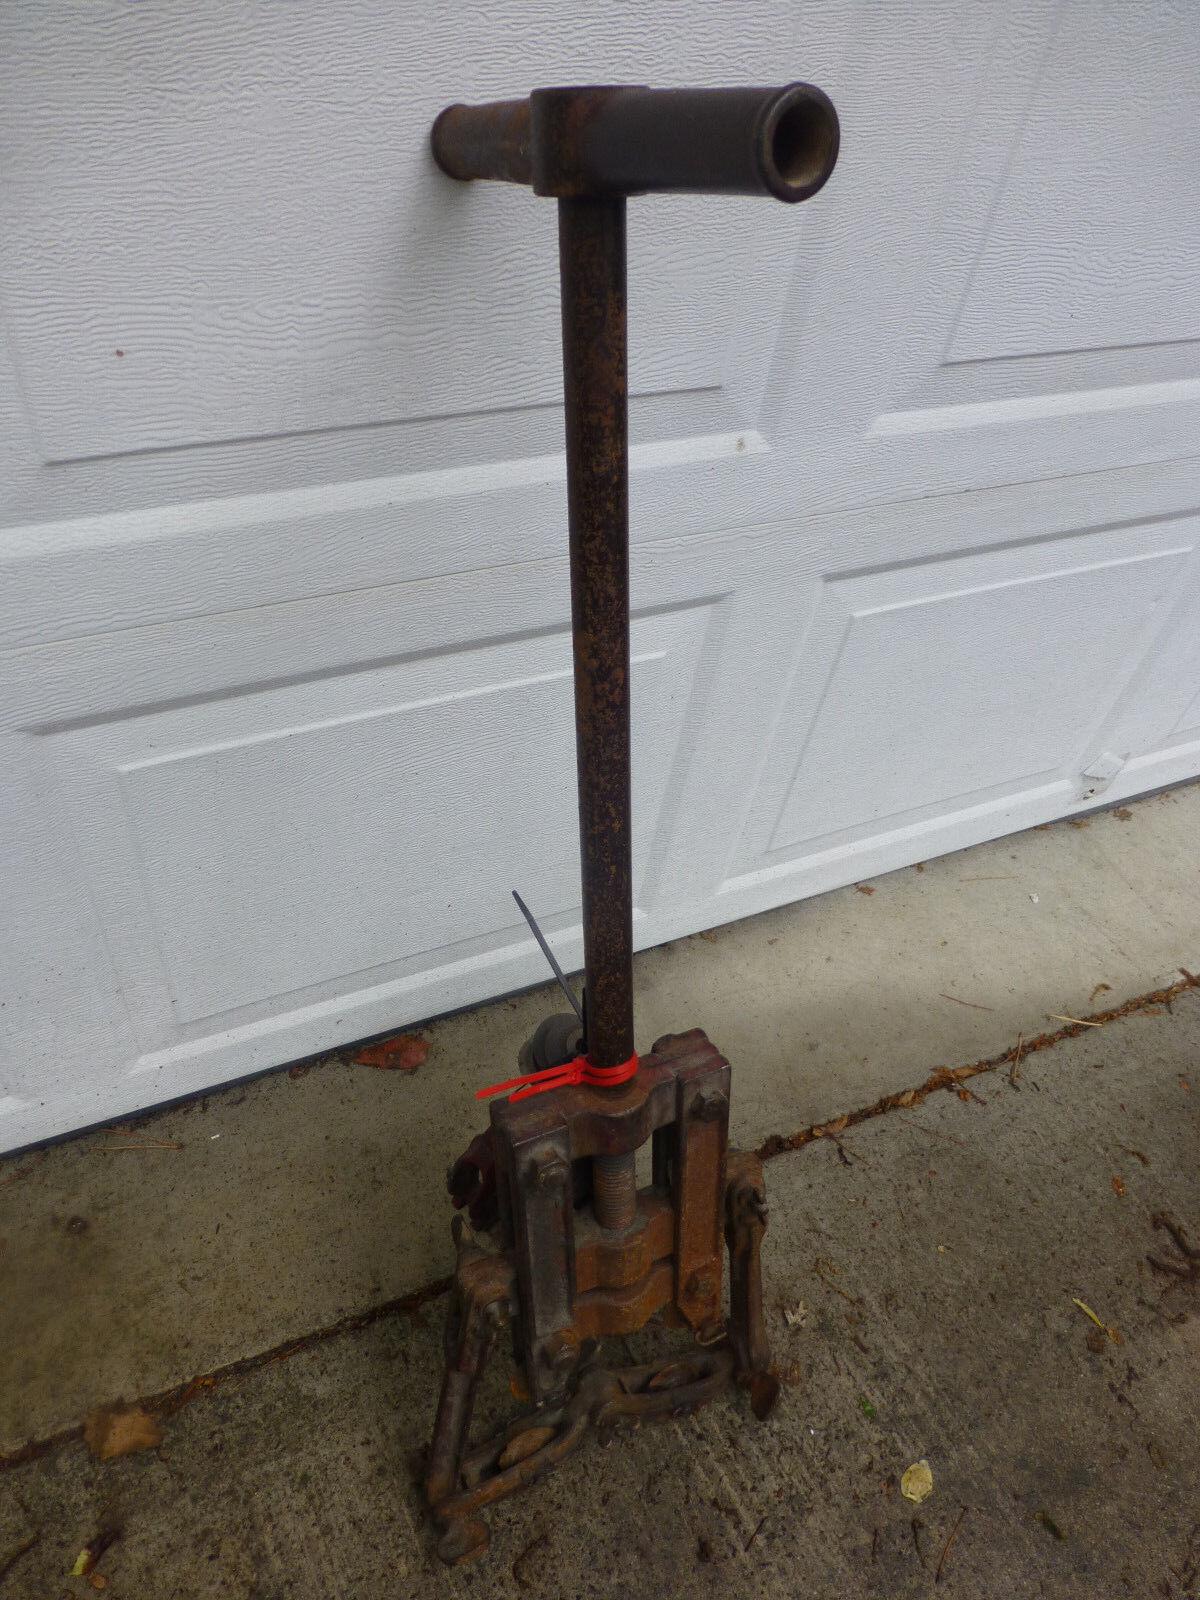 Vintage Ellis & Ford Ellis Pipe Cutter Tool plus extra cutting wheels